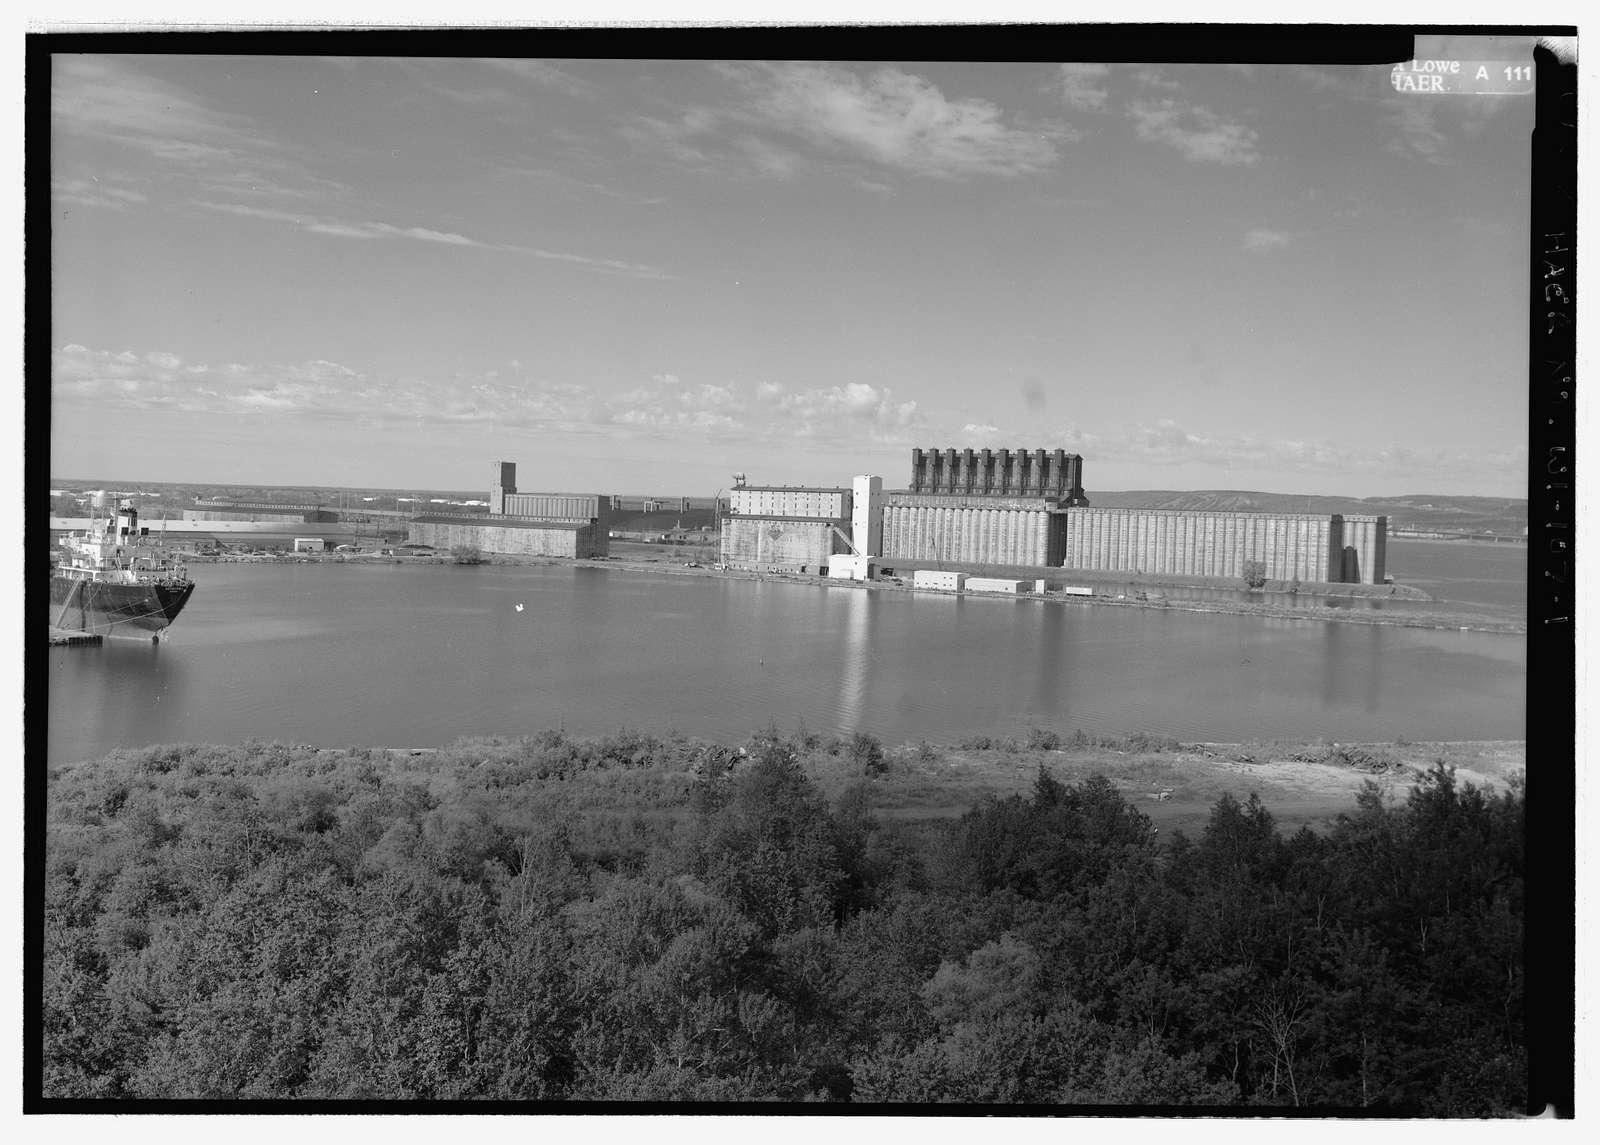 Peavey Globe Elevator, West Gate Basin & Howard's Bay, east side of slip, Superior, Douglas County, WI